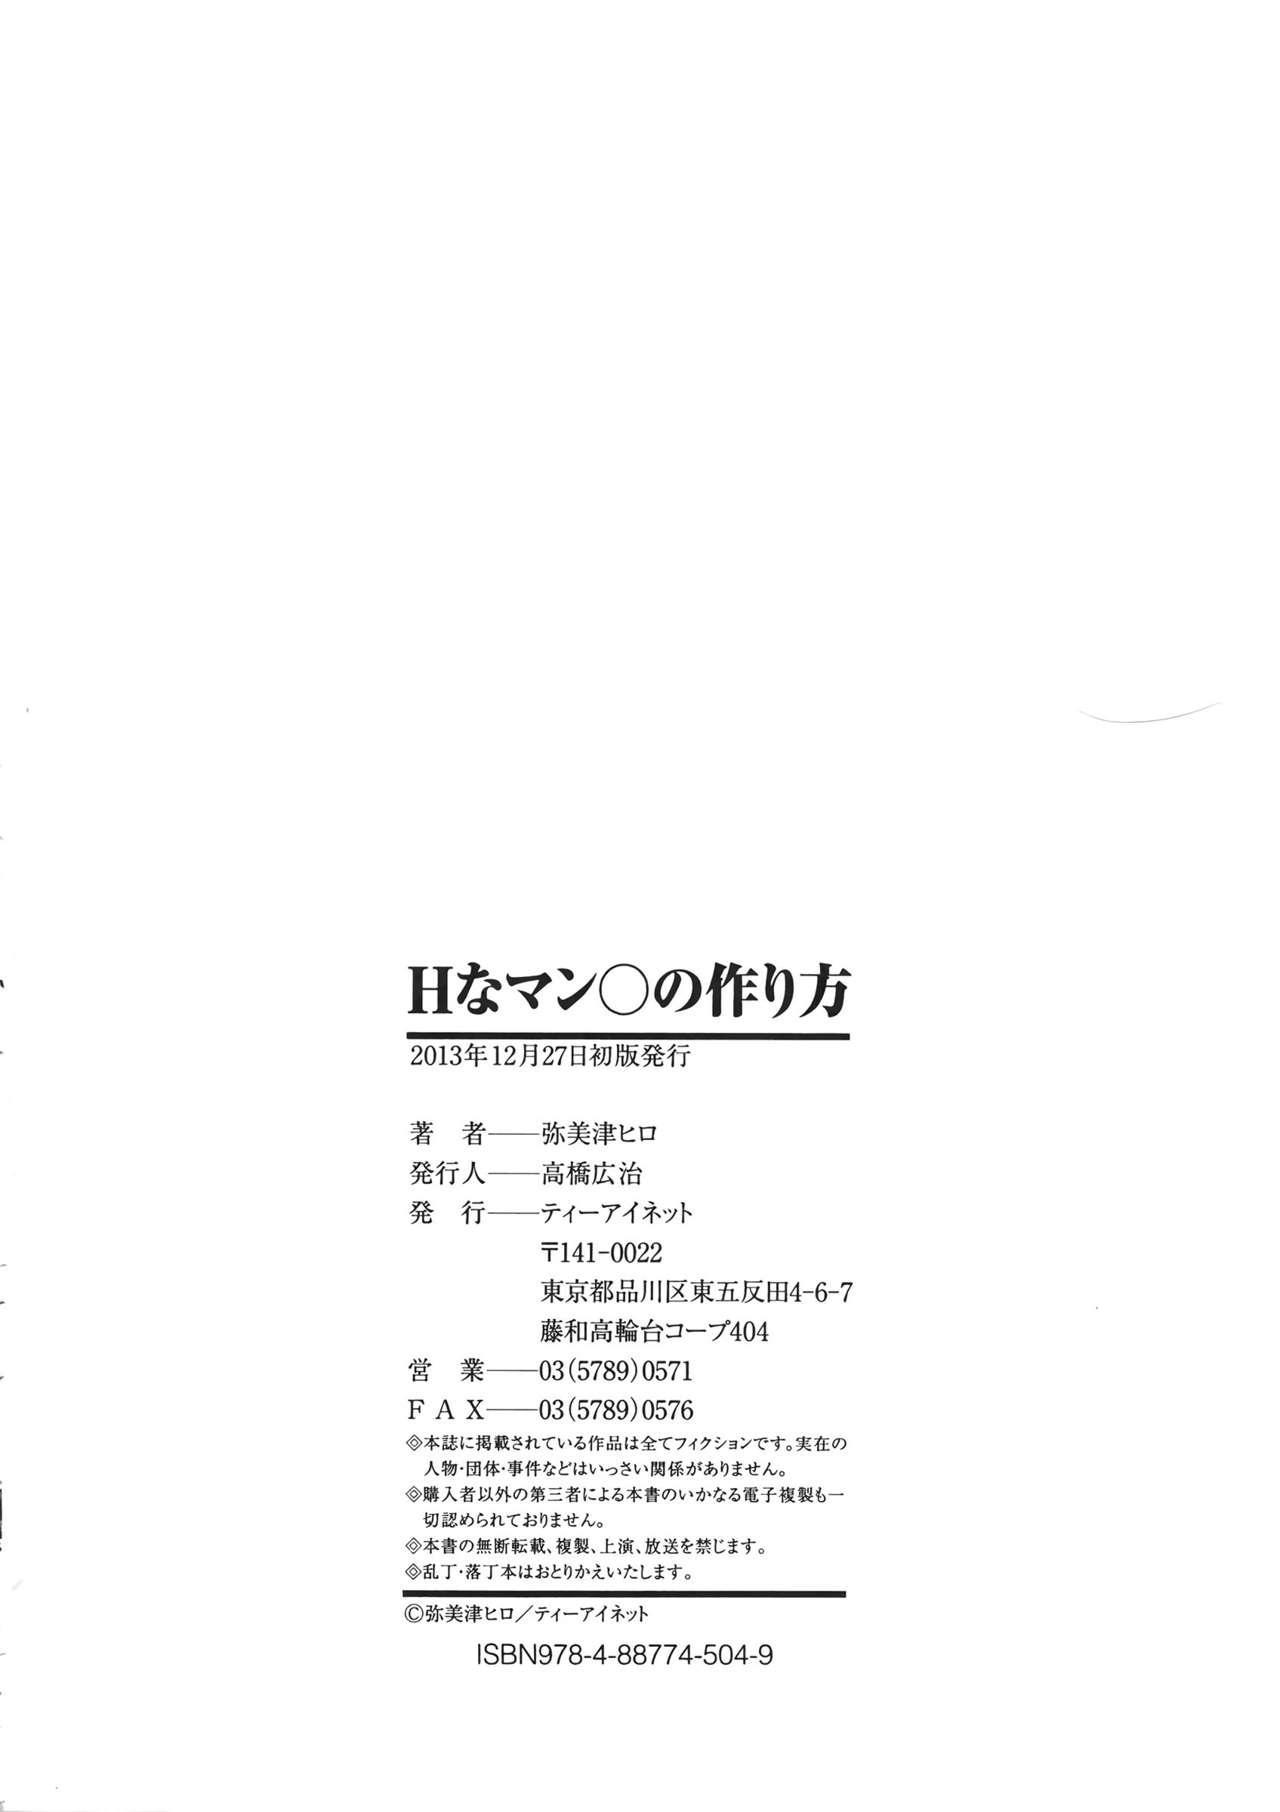 H na Manko no Tsukurikata 221